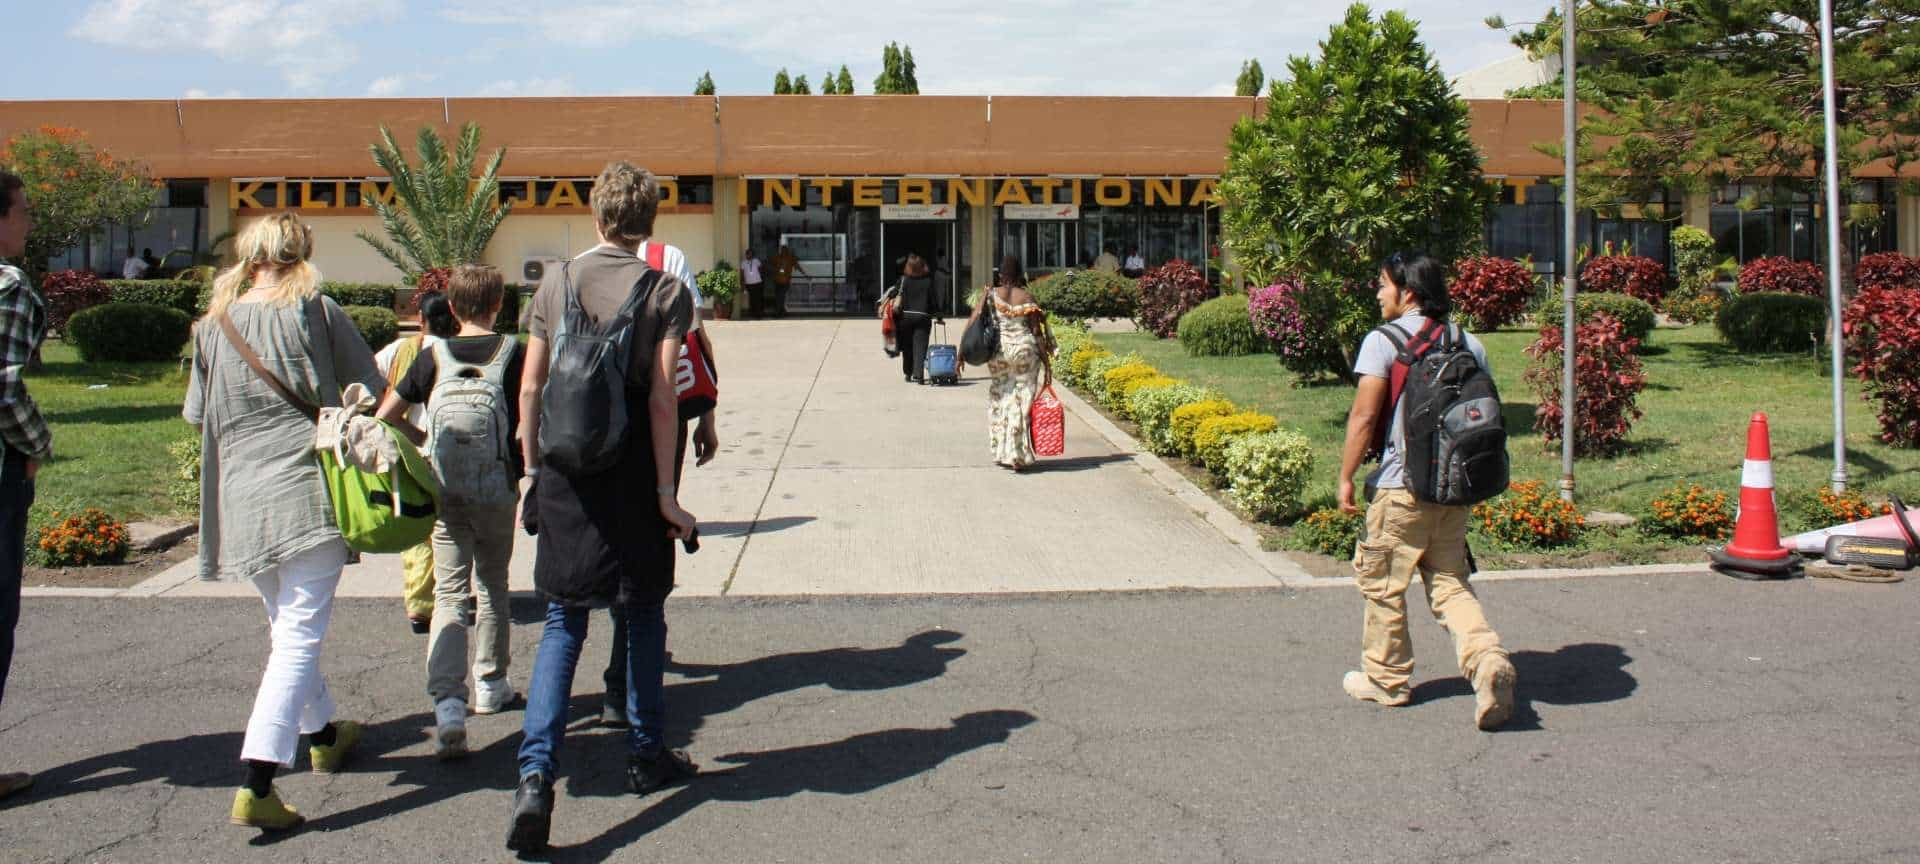 Arrival At Kilimajaro Airport